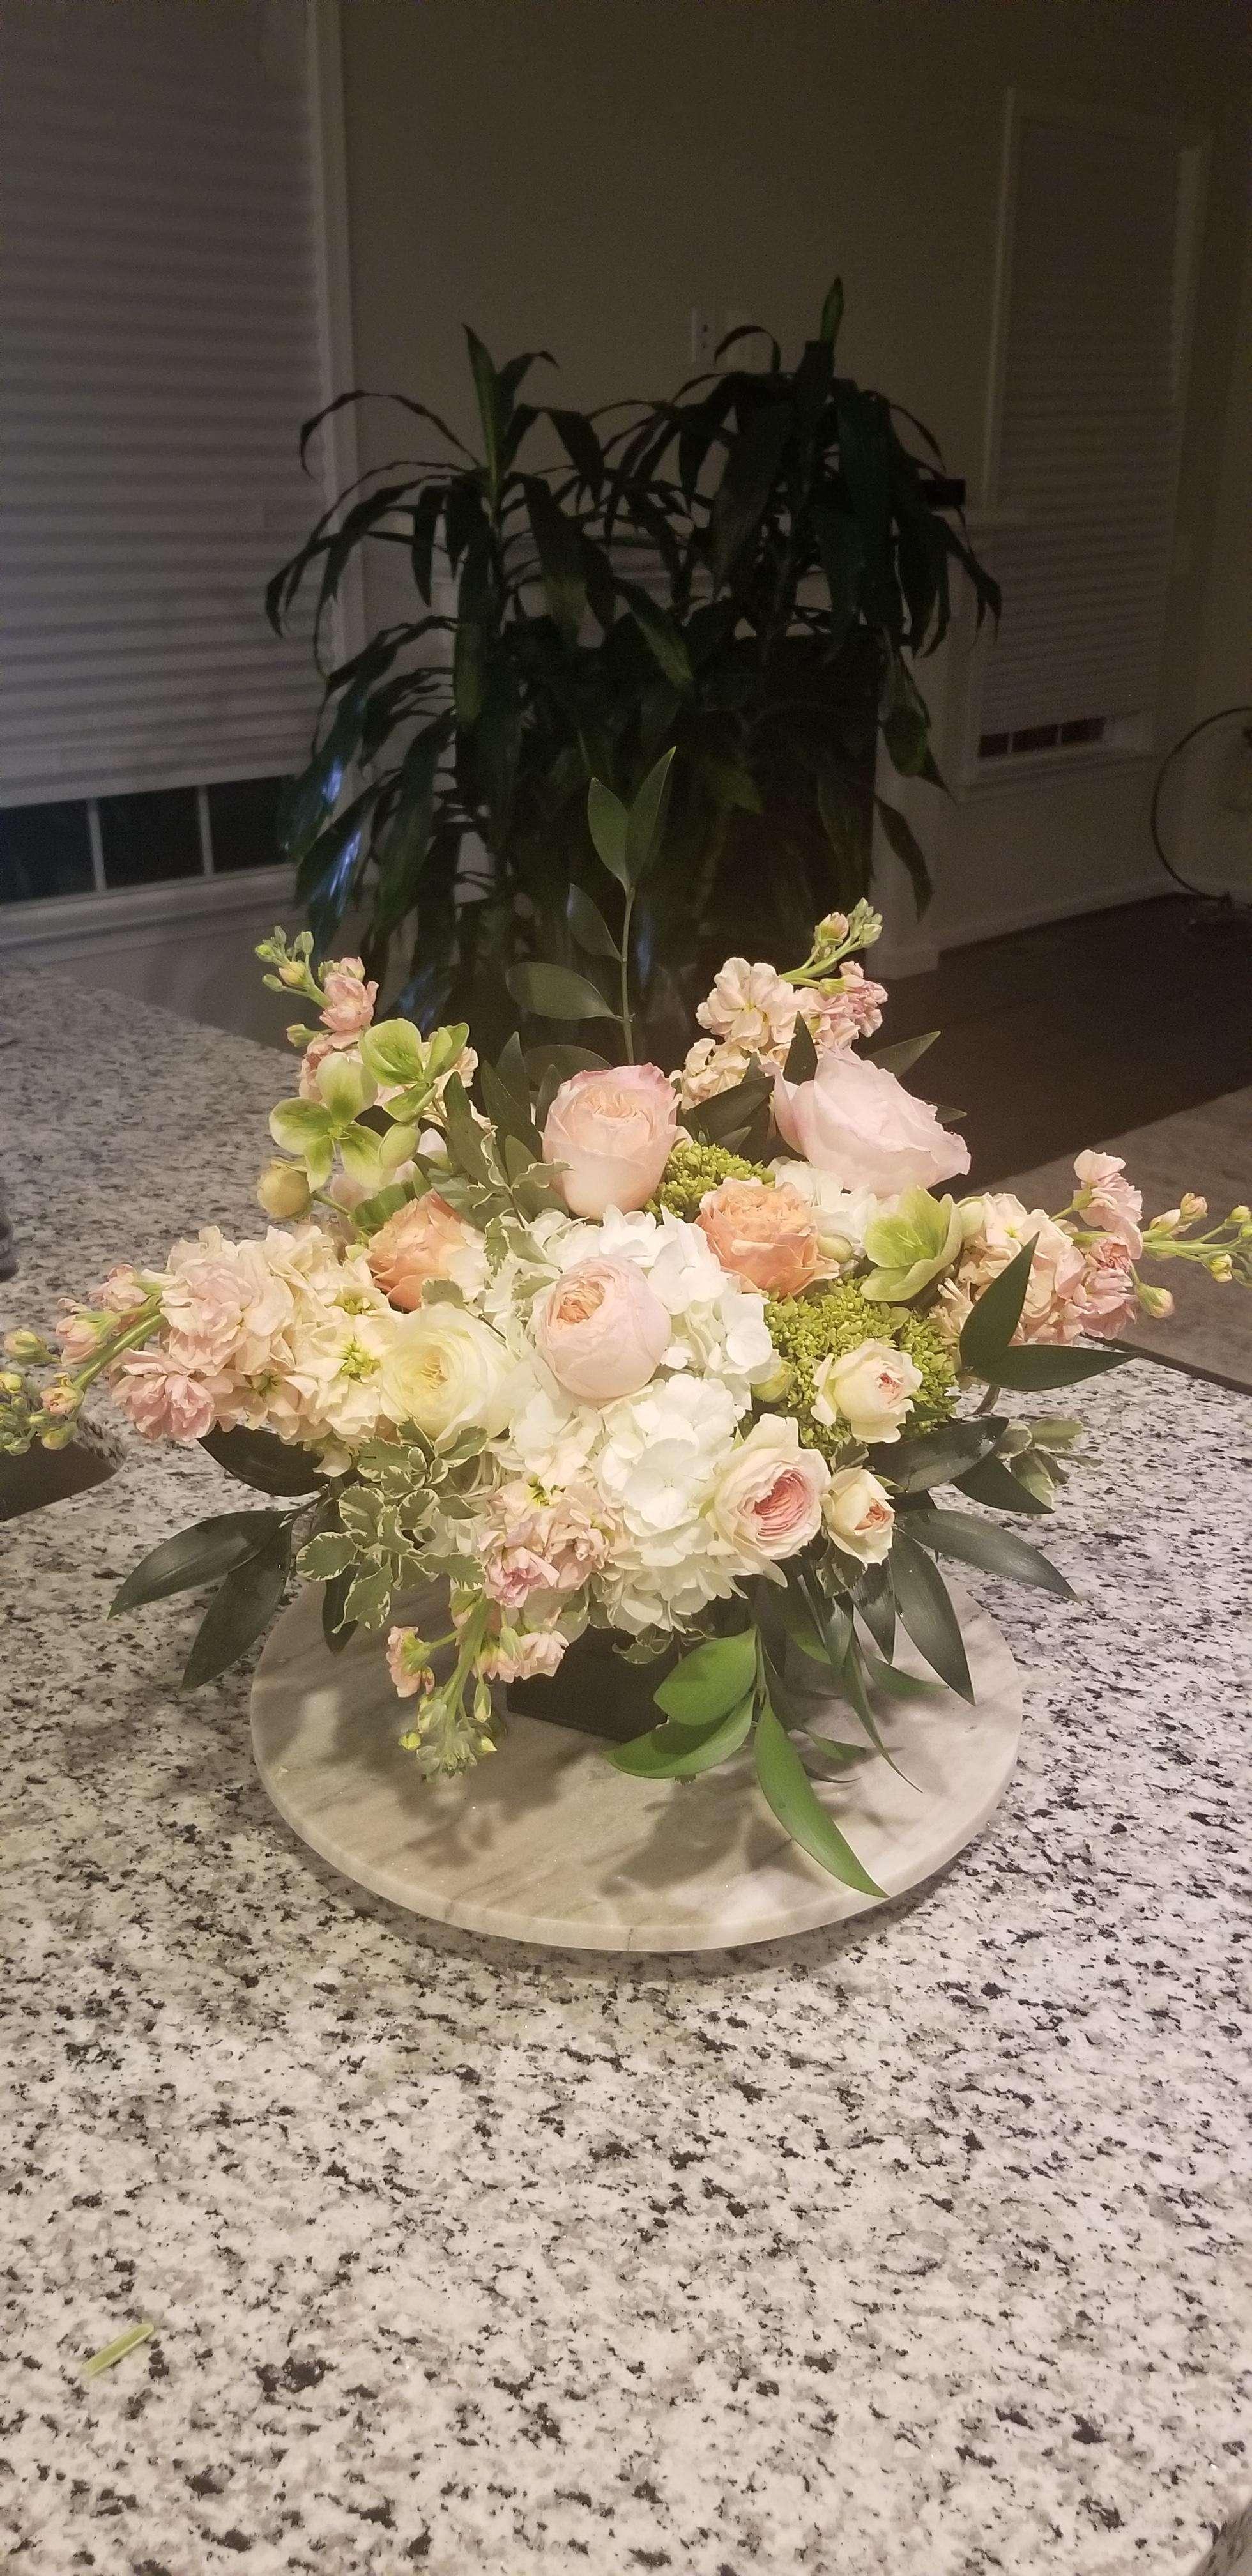 Jenna Visco's flower arrangement